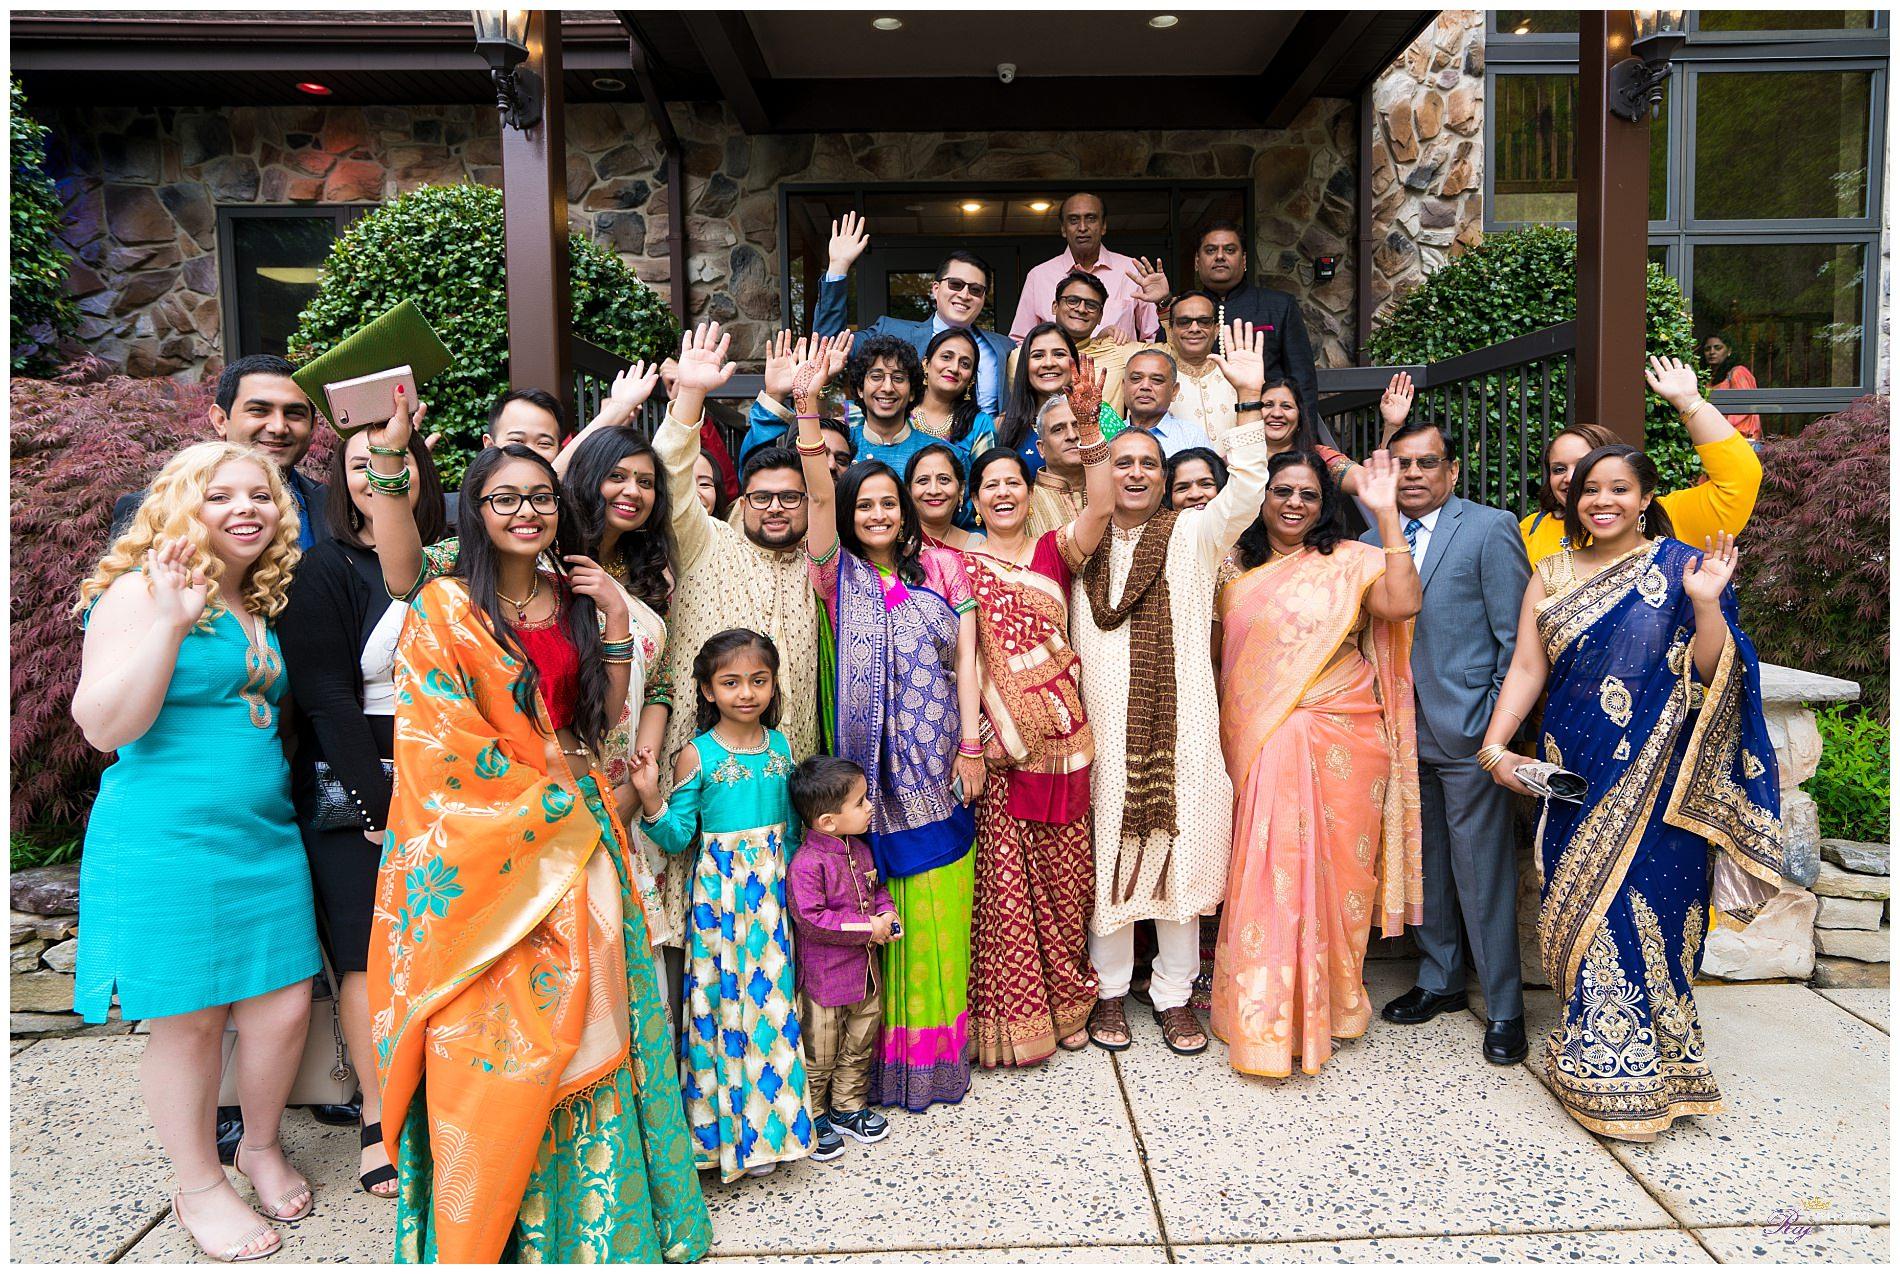 Martinsville-Gardens-NJ-Indian-Wedding-Ruchi-Vishal-19.jpg